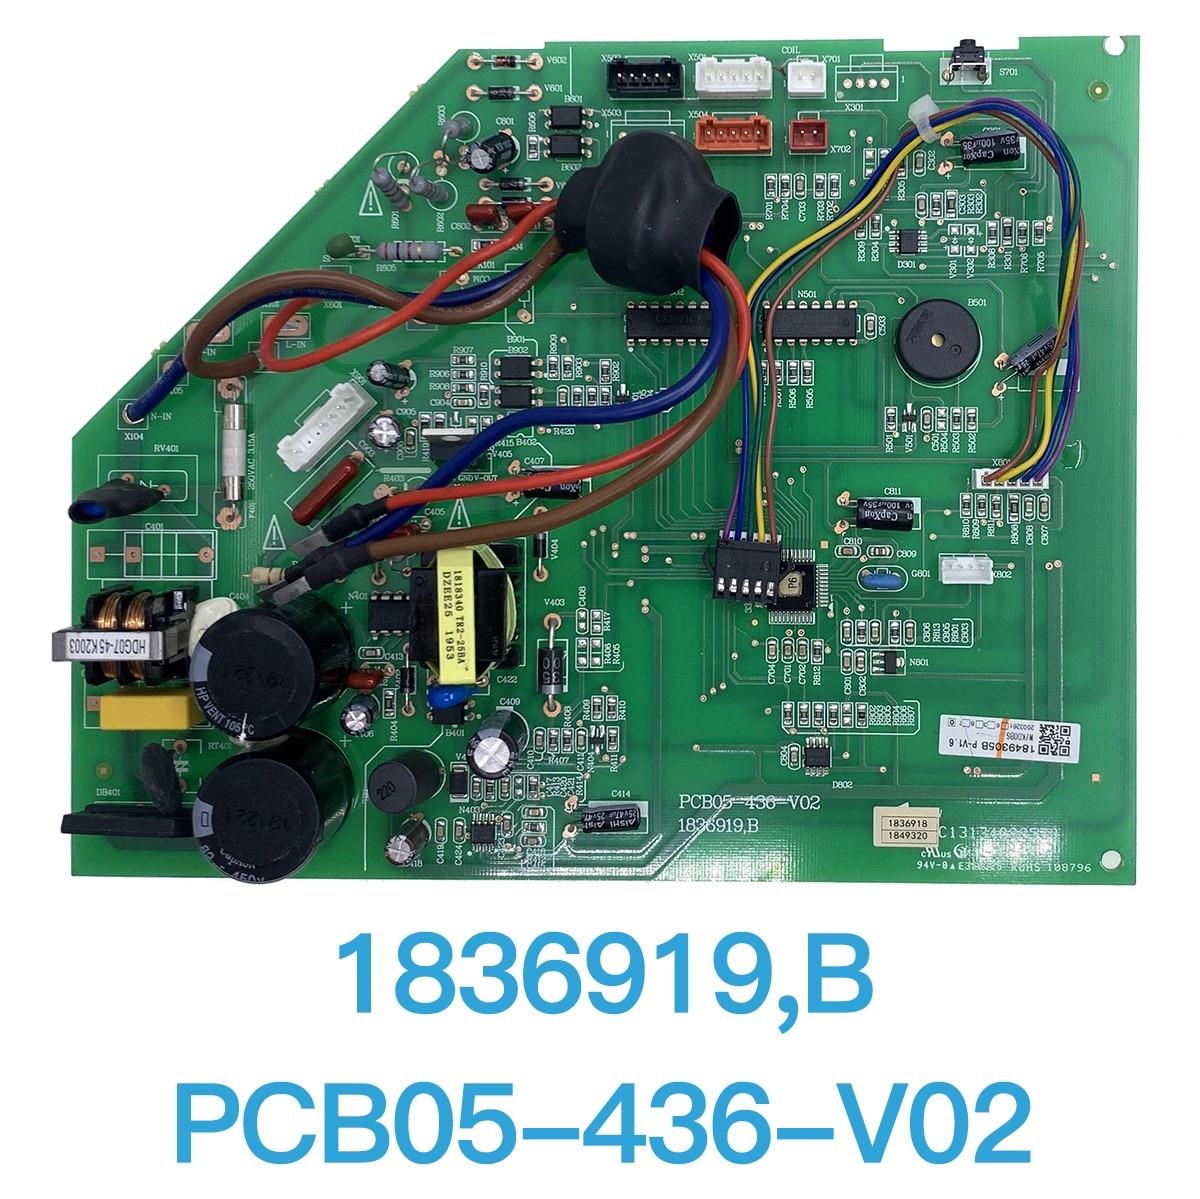 PCB05-436-V02 1836919.B مكيف الهواء الرئيسية لوحة دوائر كهربائية ل الكلاسيكية HWDKC30S HWDKC36S